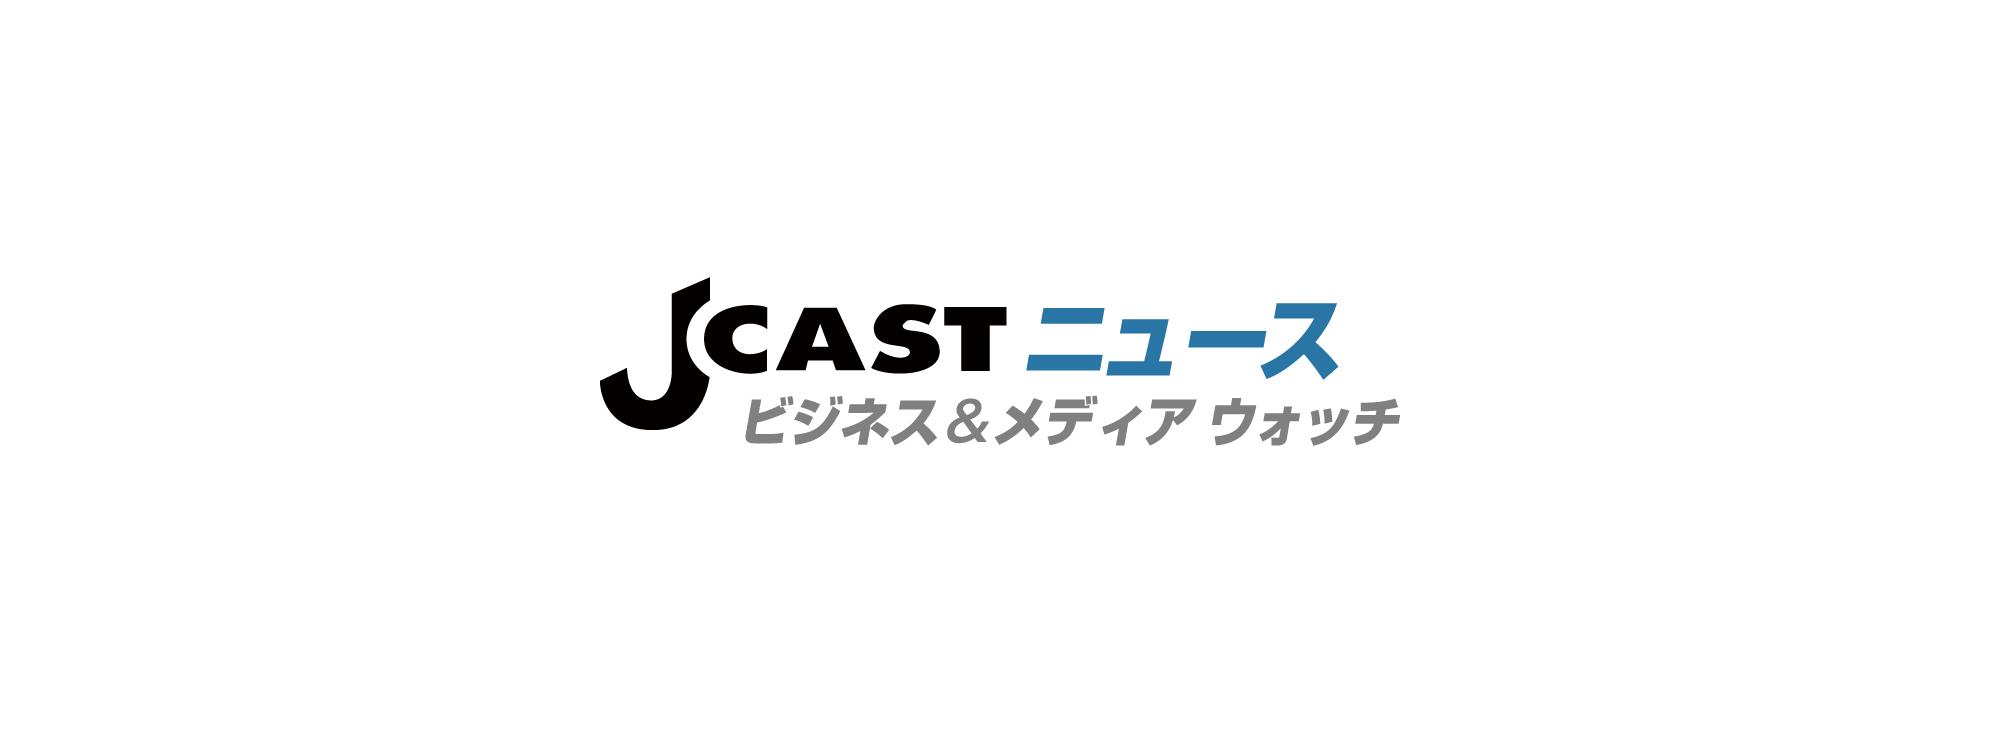 AKBに「恋愛禁止令」なんてなかった? 秋元氏「僕は一度も言ってない」発言で波紋 : J-CASTニュース